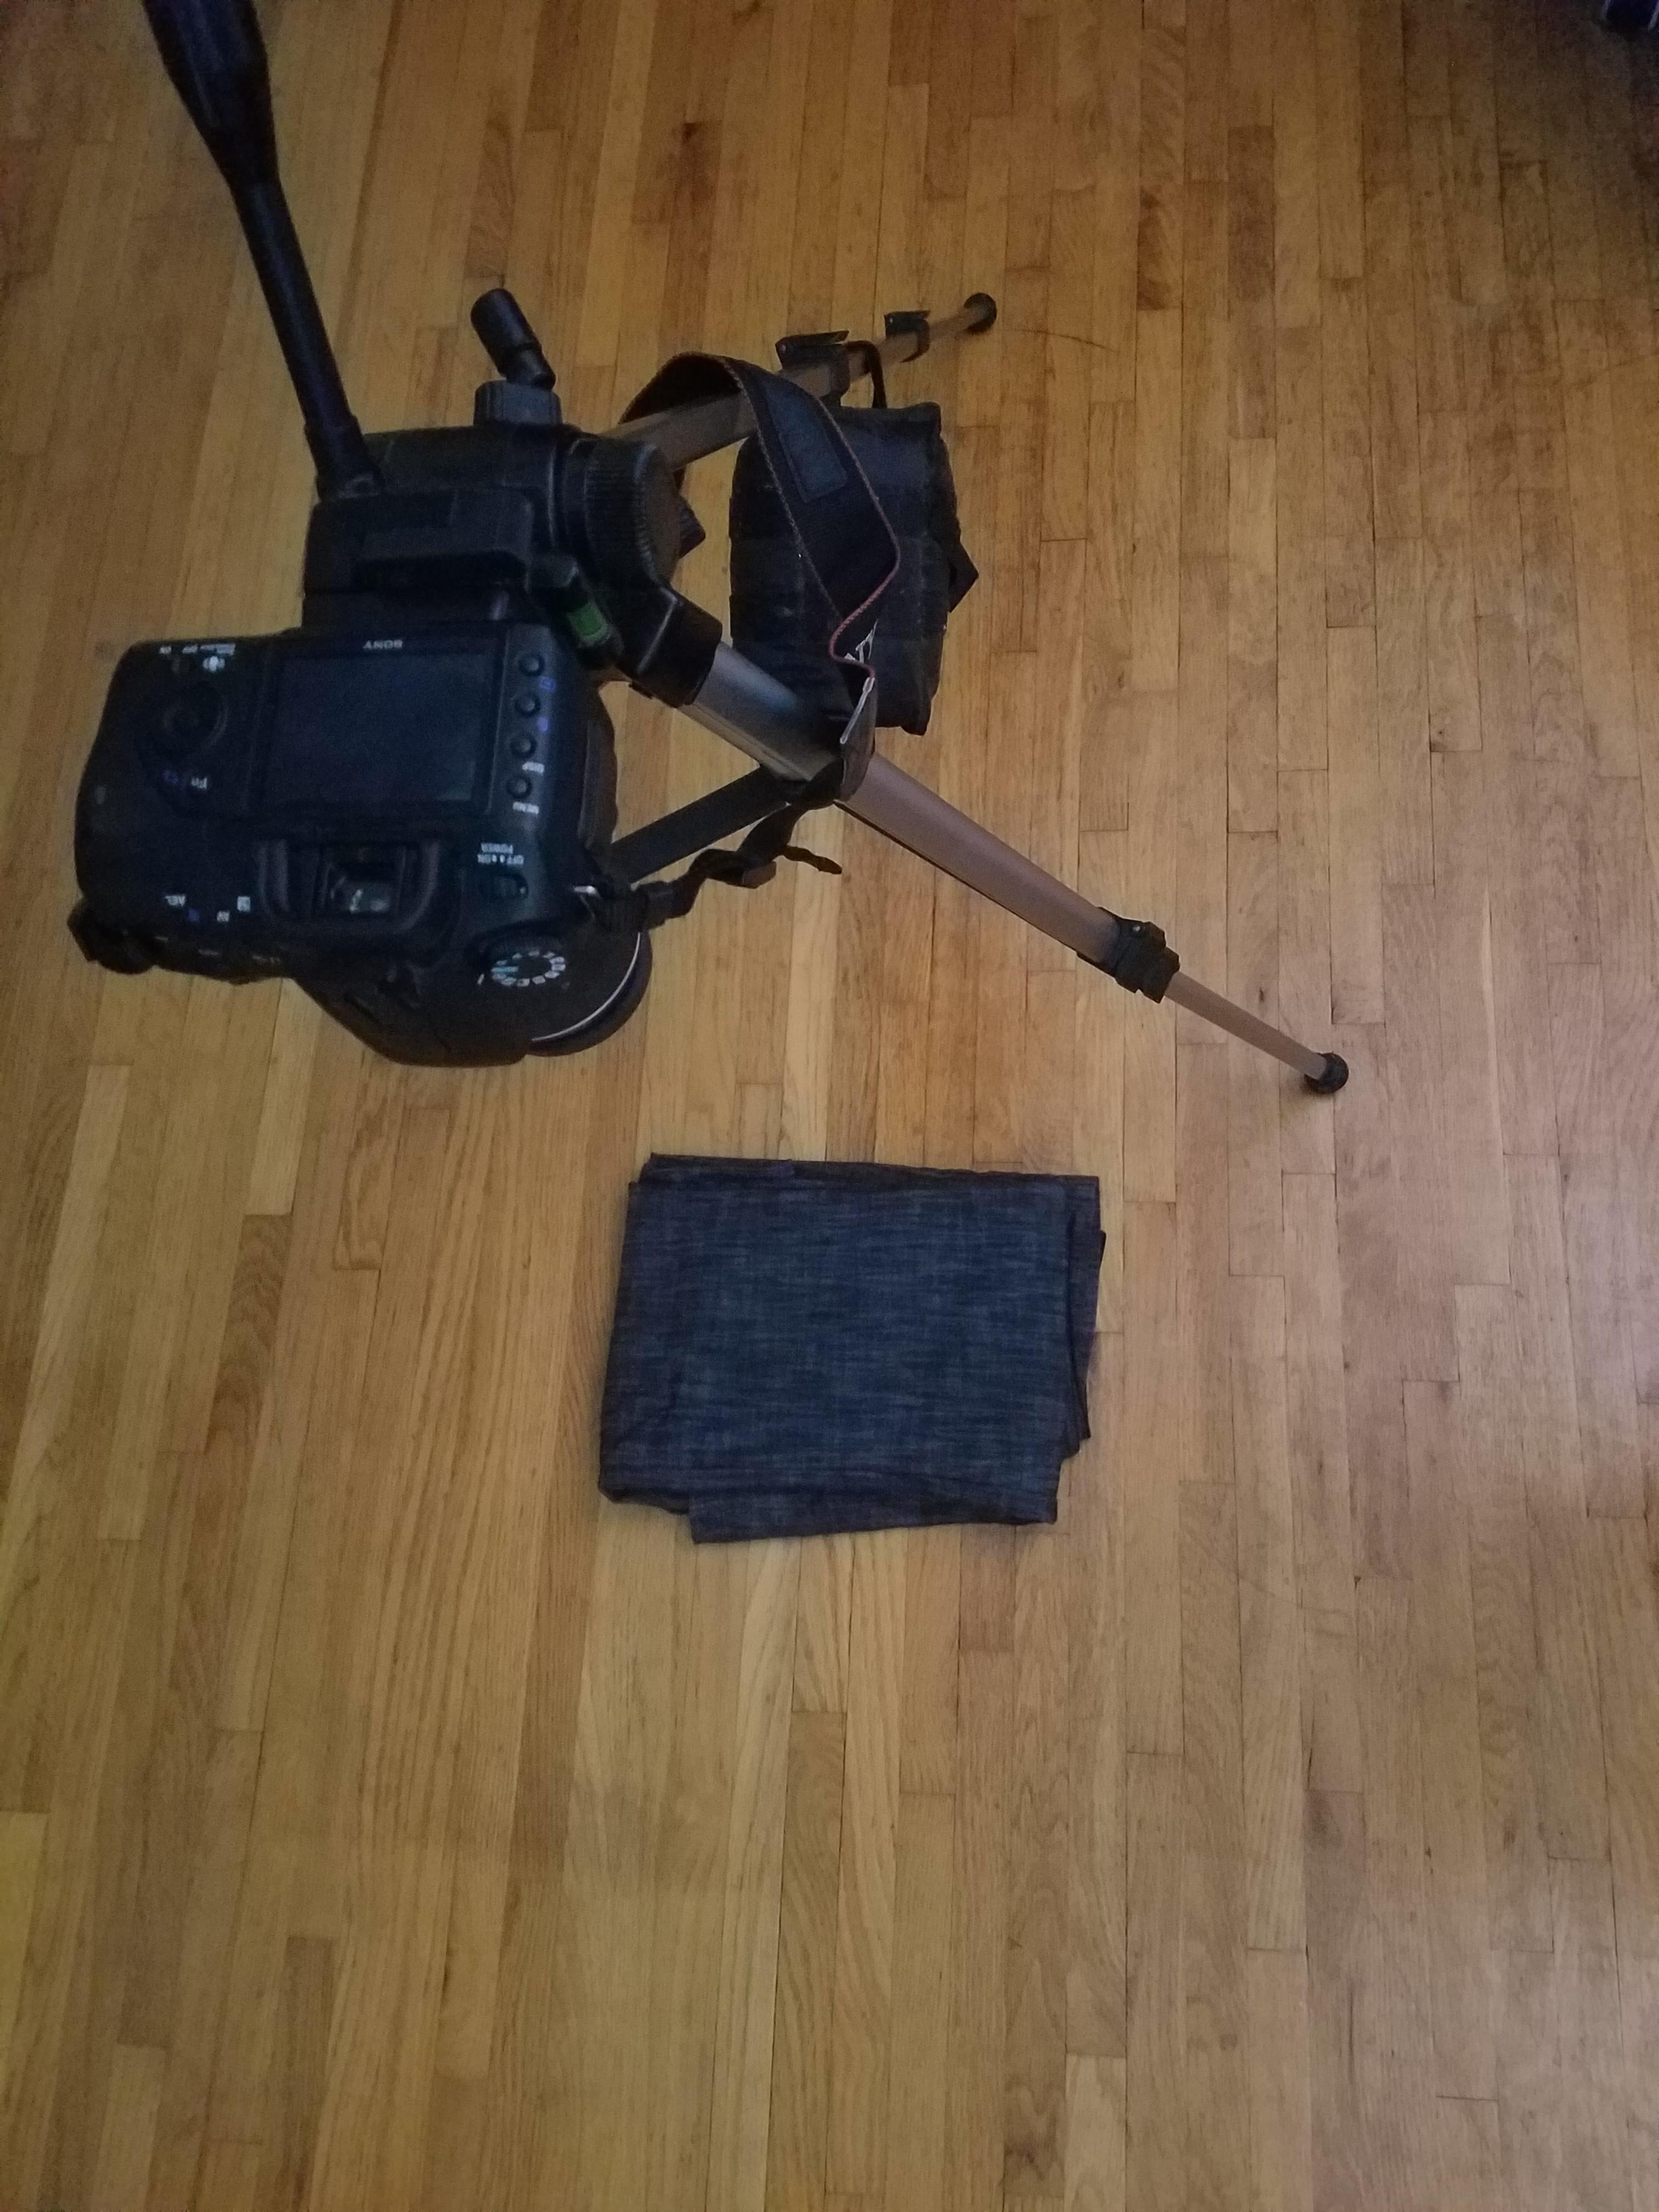 RTI scan setup ( Used my phone's flash as a light)